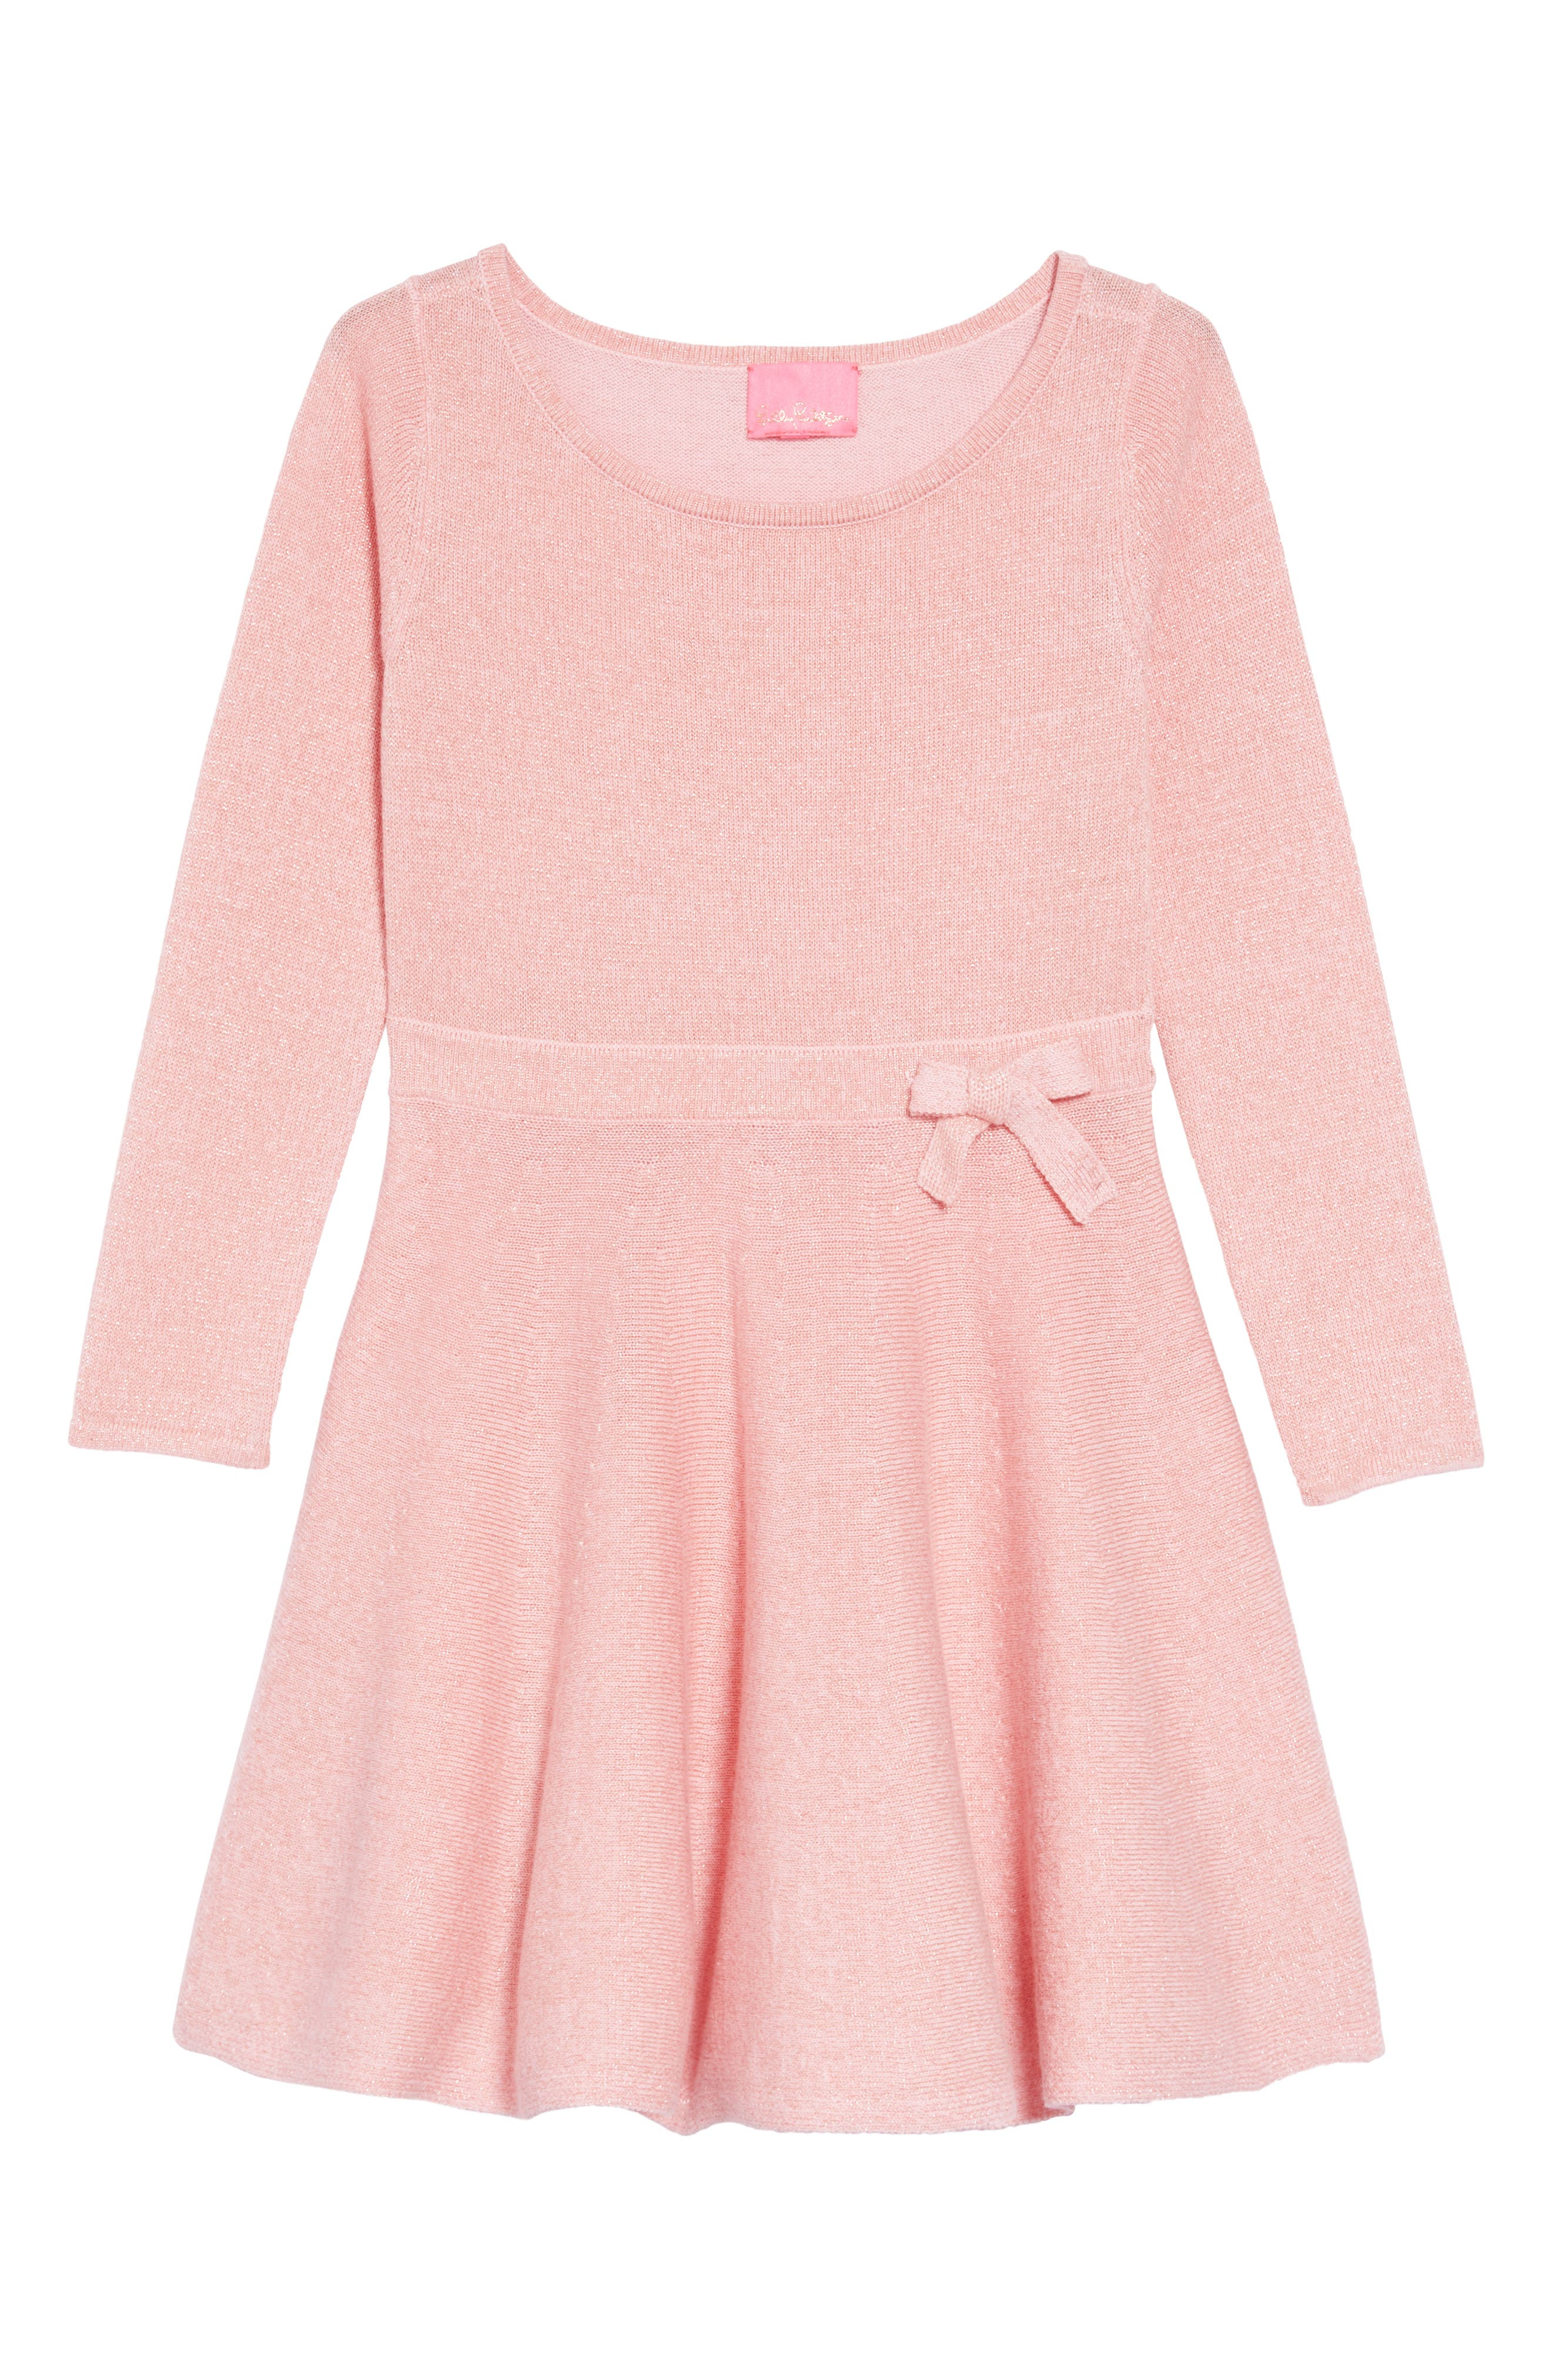 Girls Lilly Pulitzer Carynn Sweater Dress